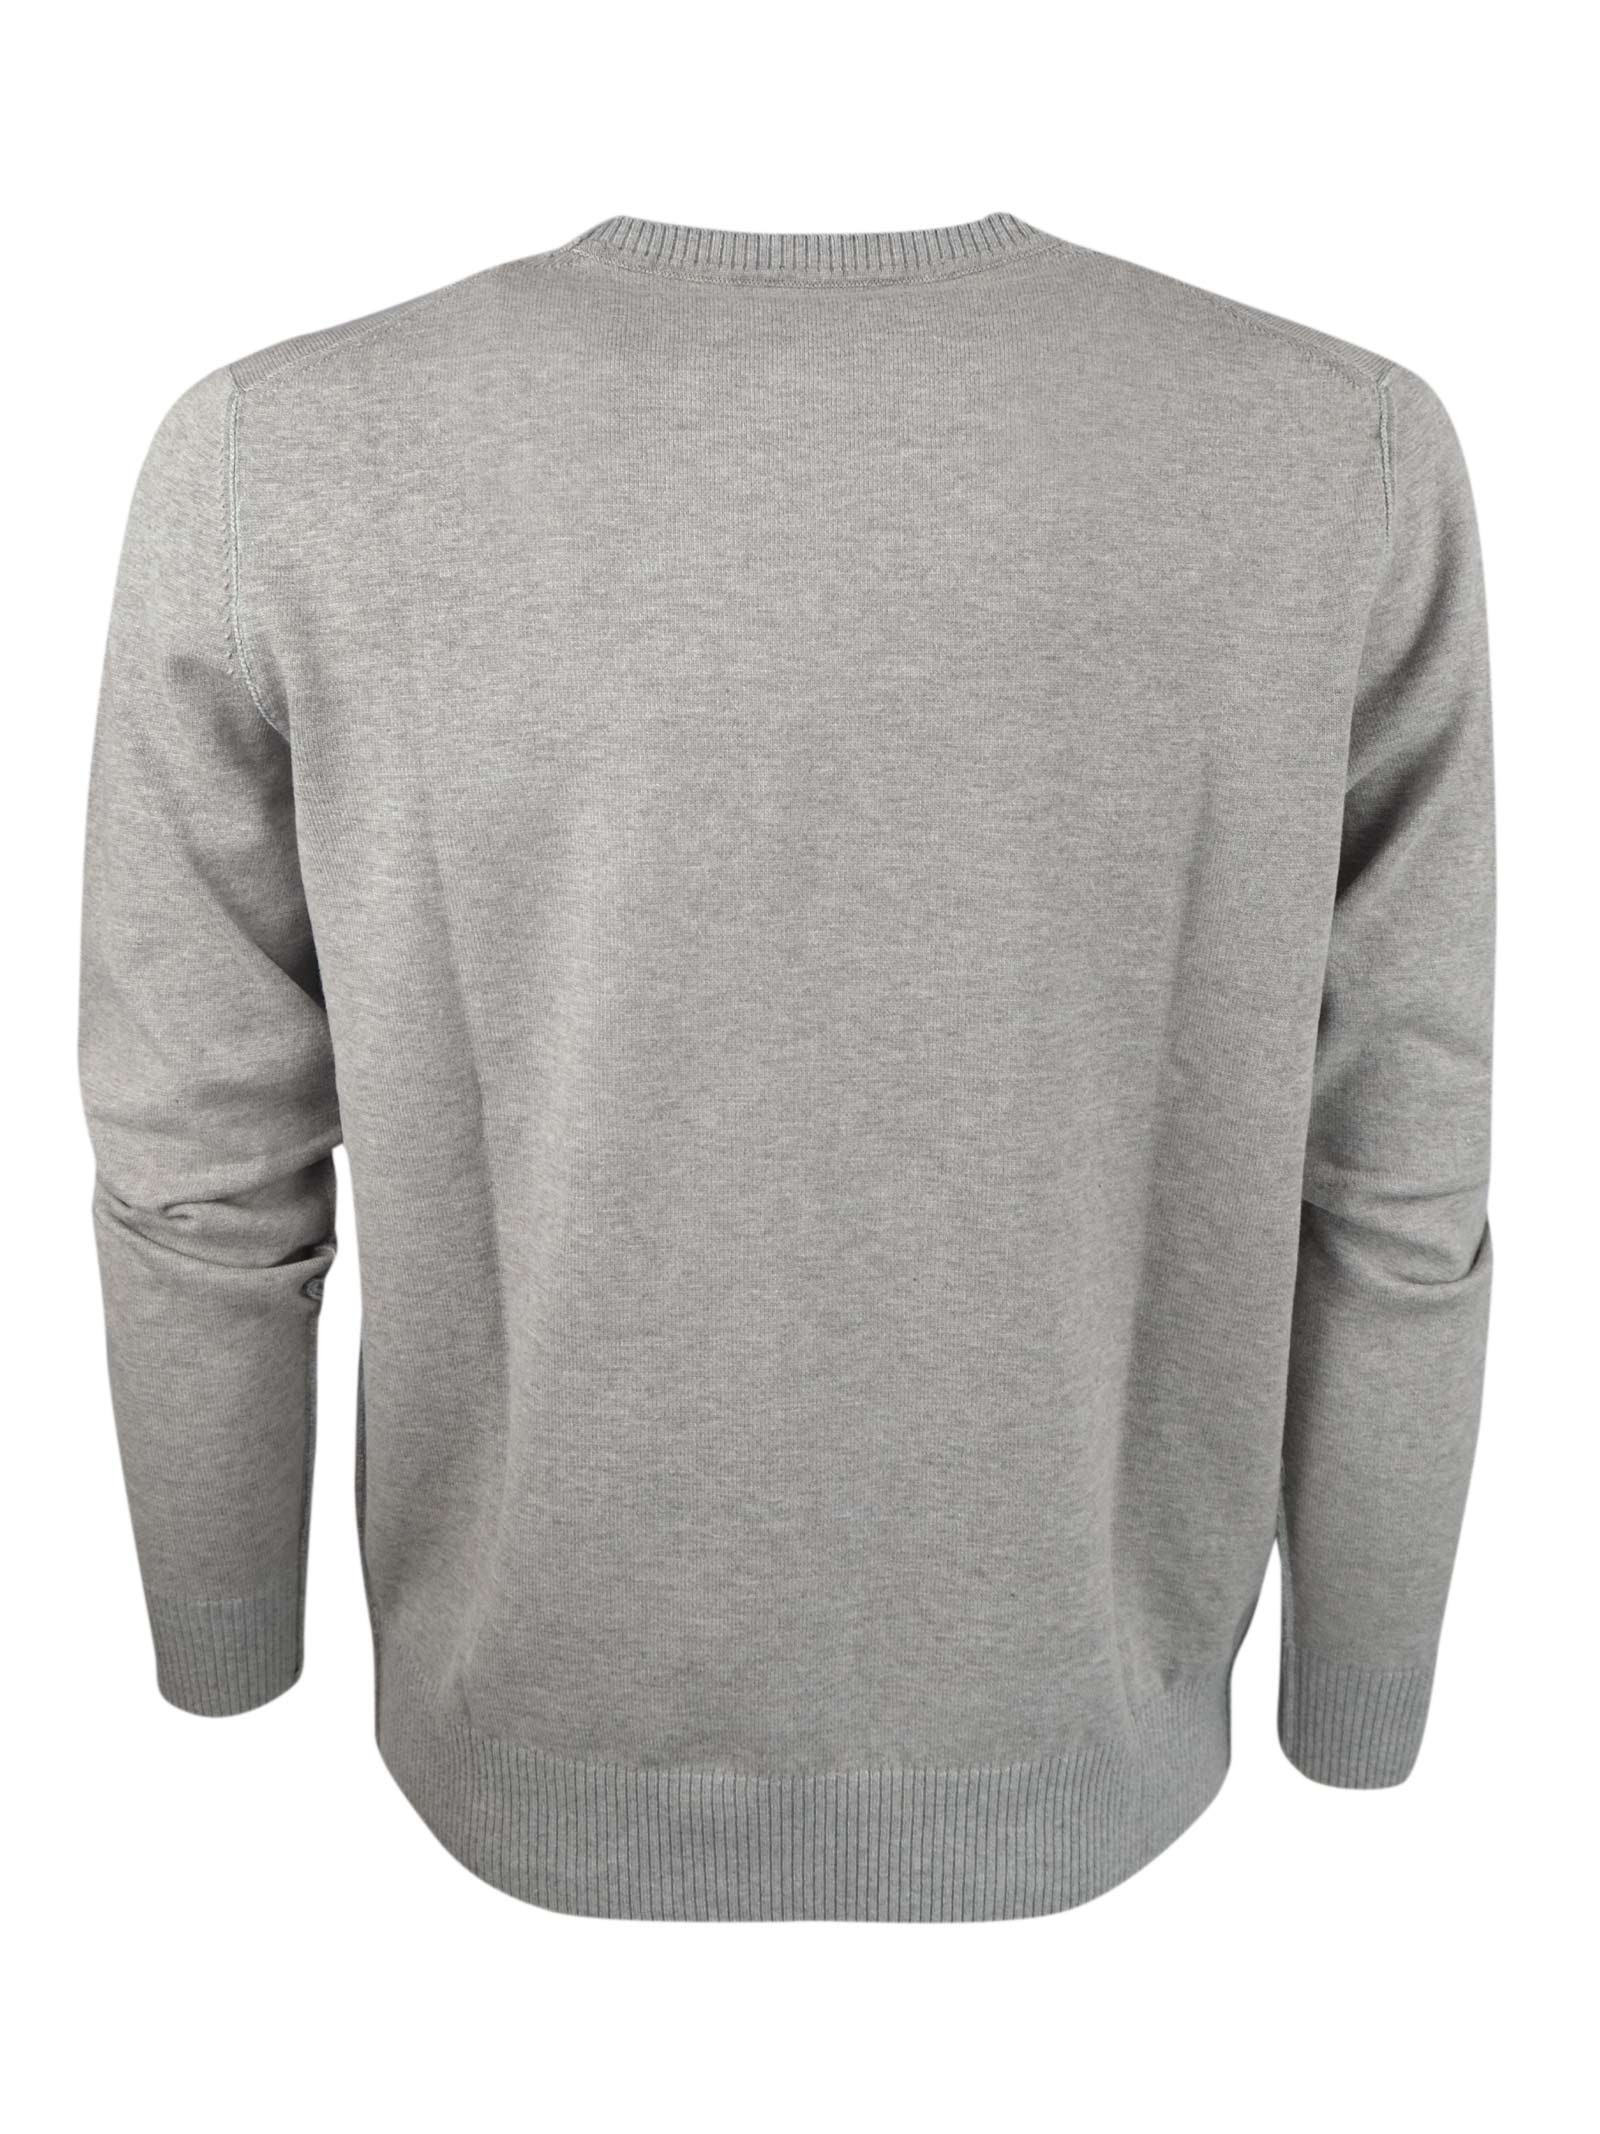 DOUBLE FACE CREW NECK H953 | Knitwear | 32141004